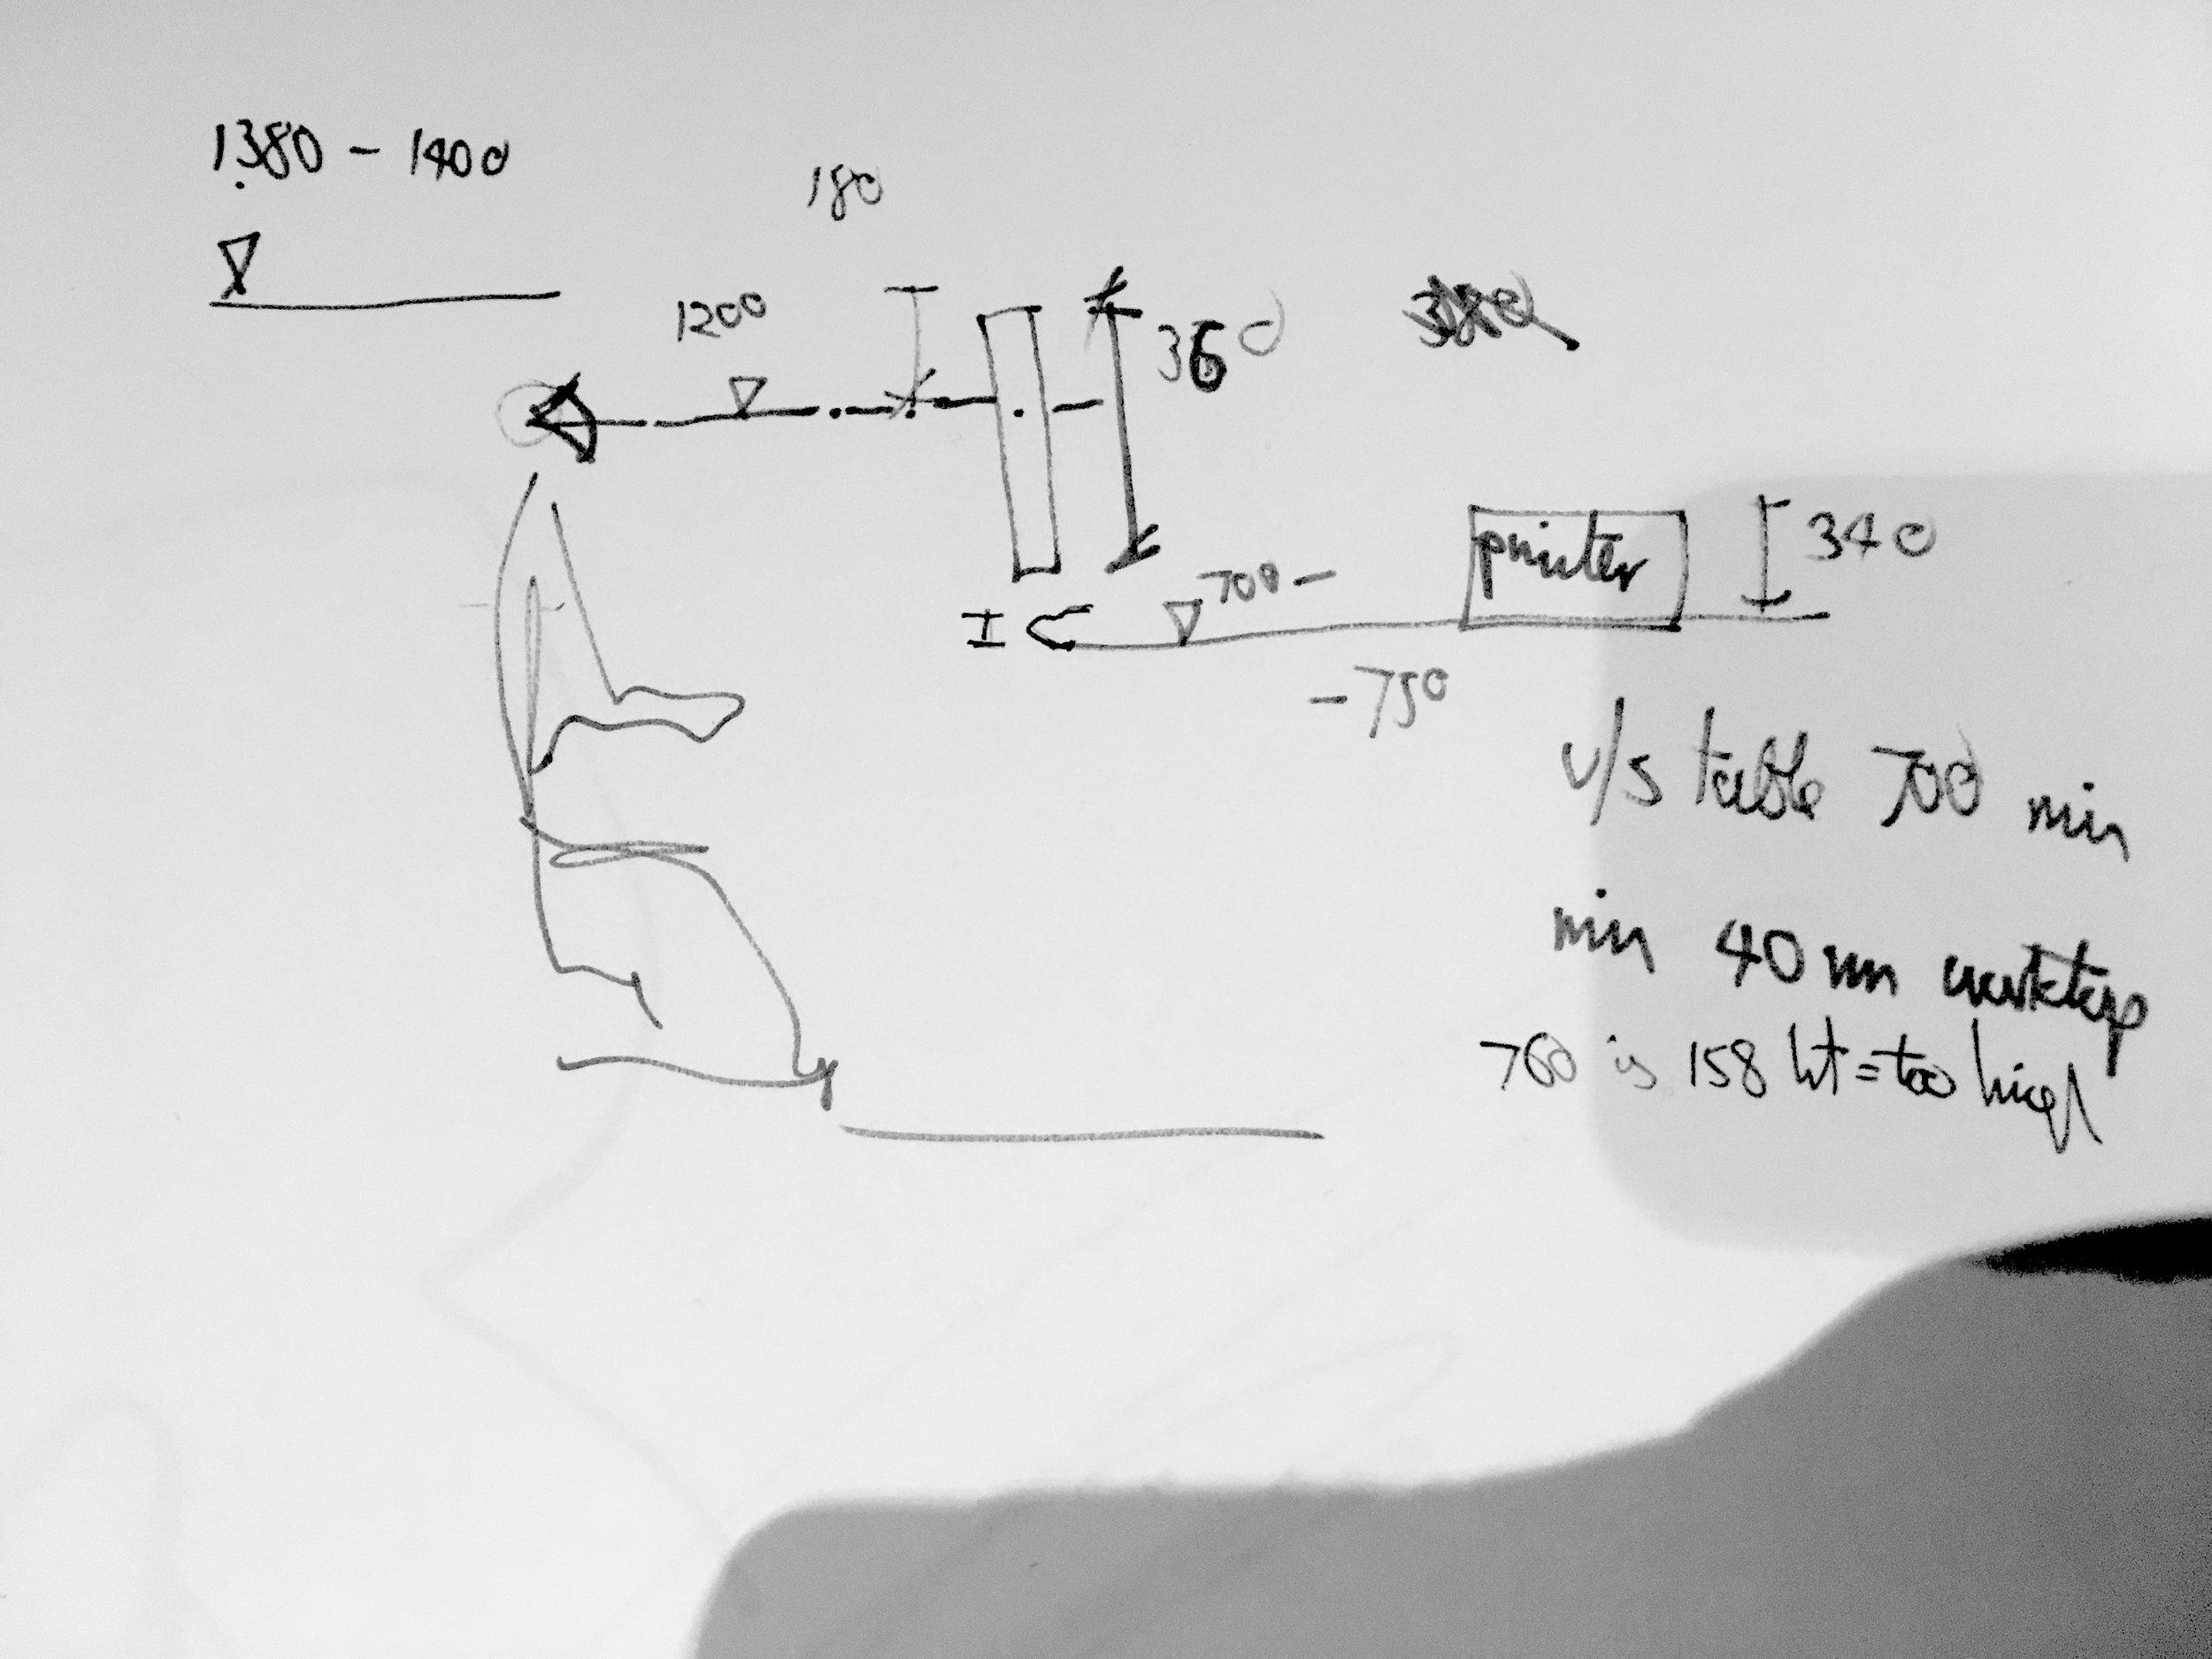 FINEarchitecture_HarveyWheeler_sketch3.JPG